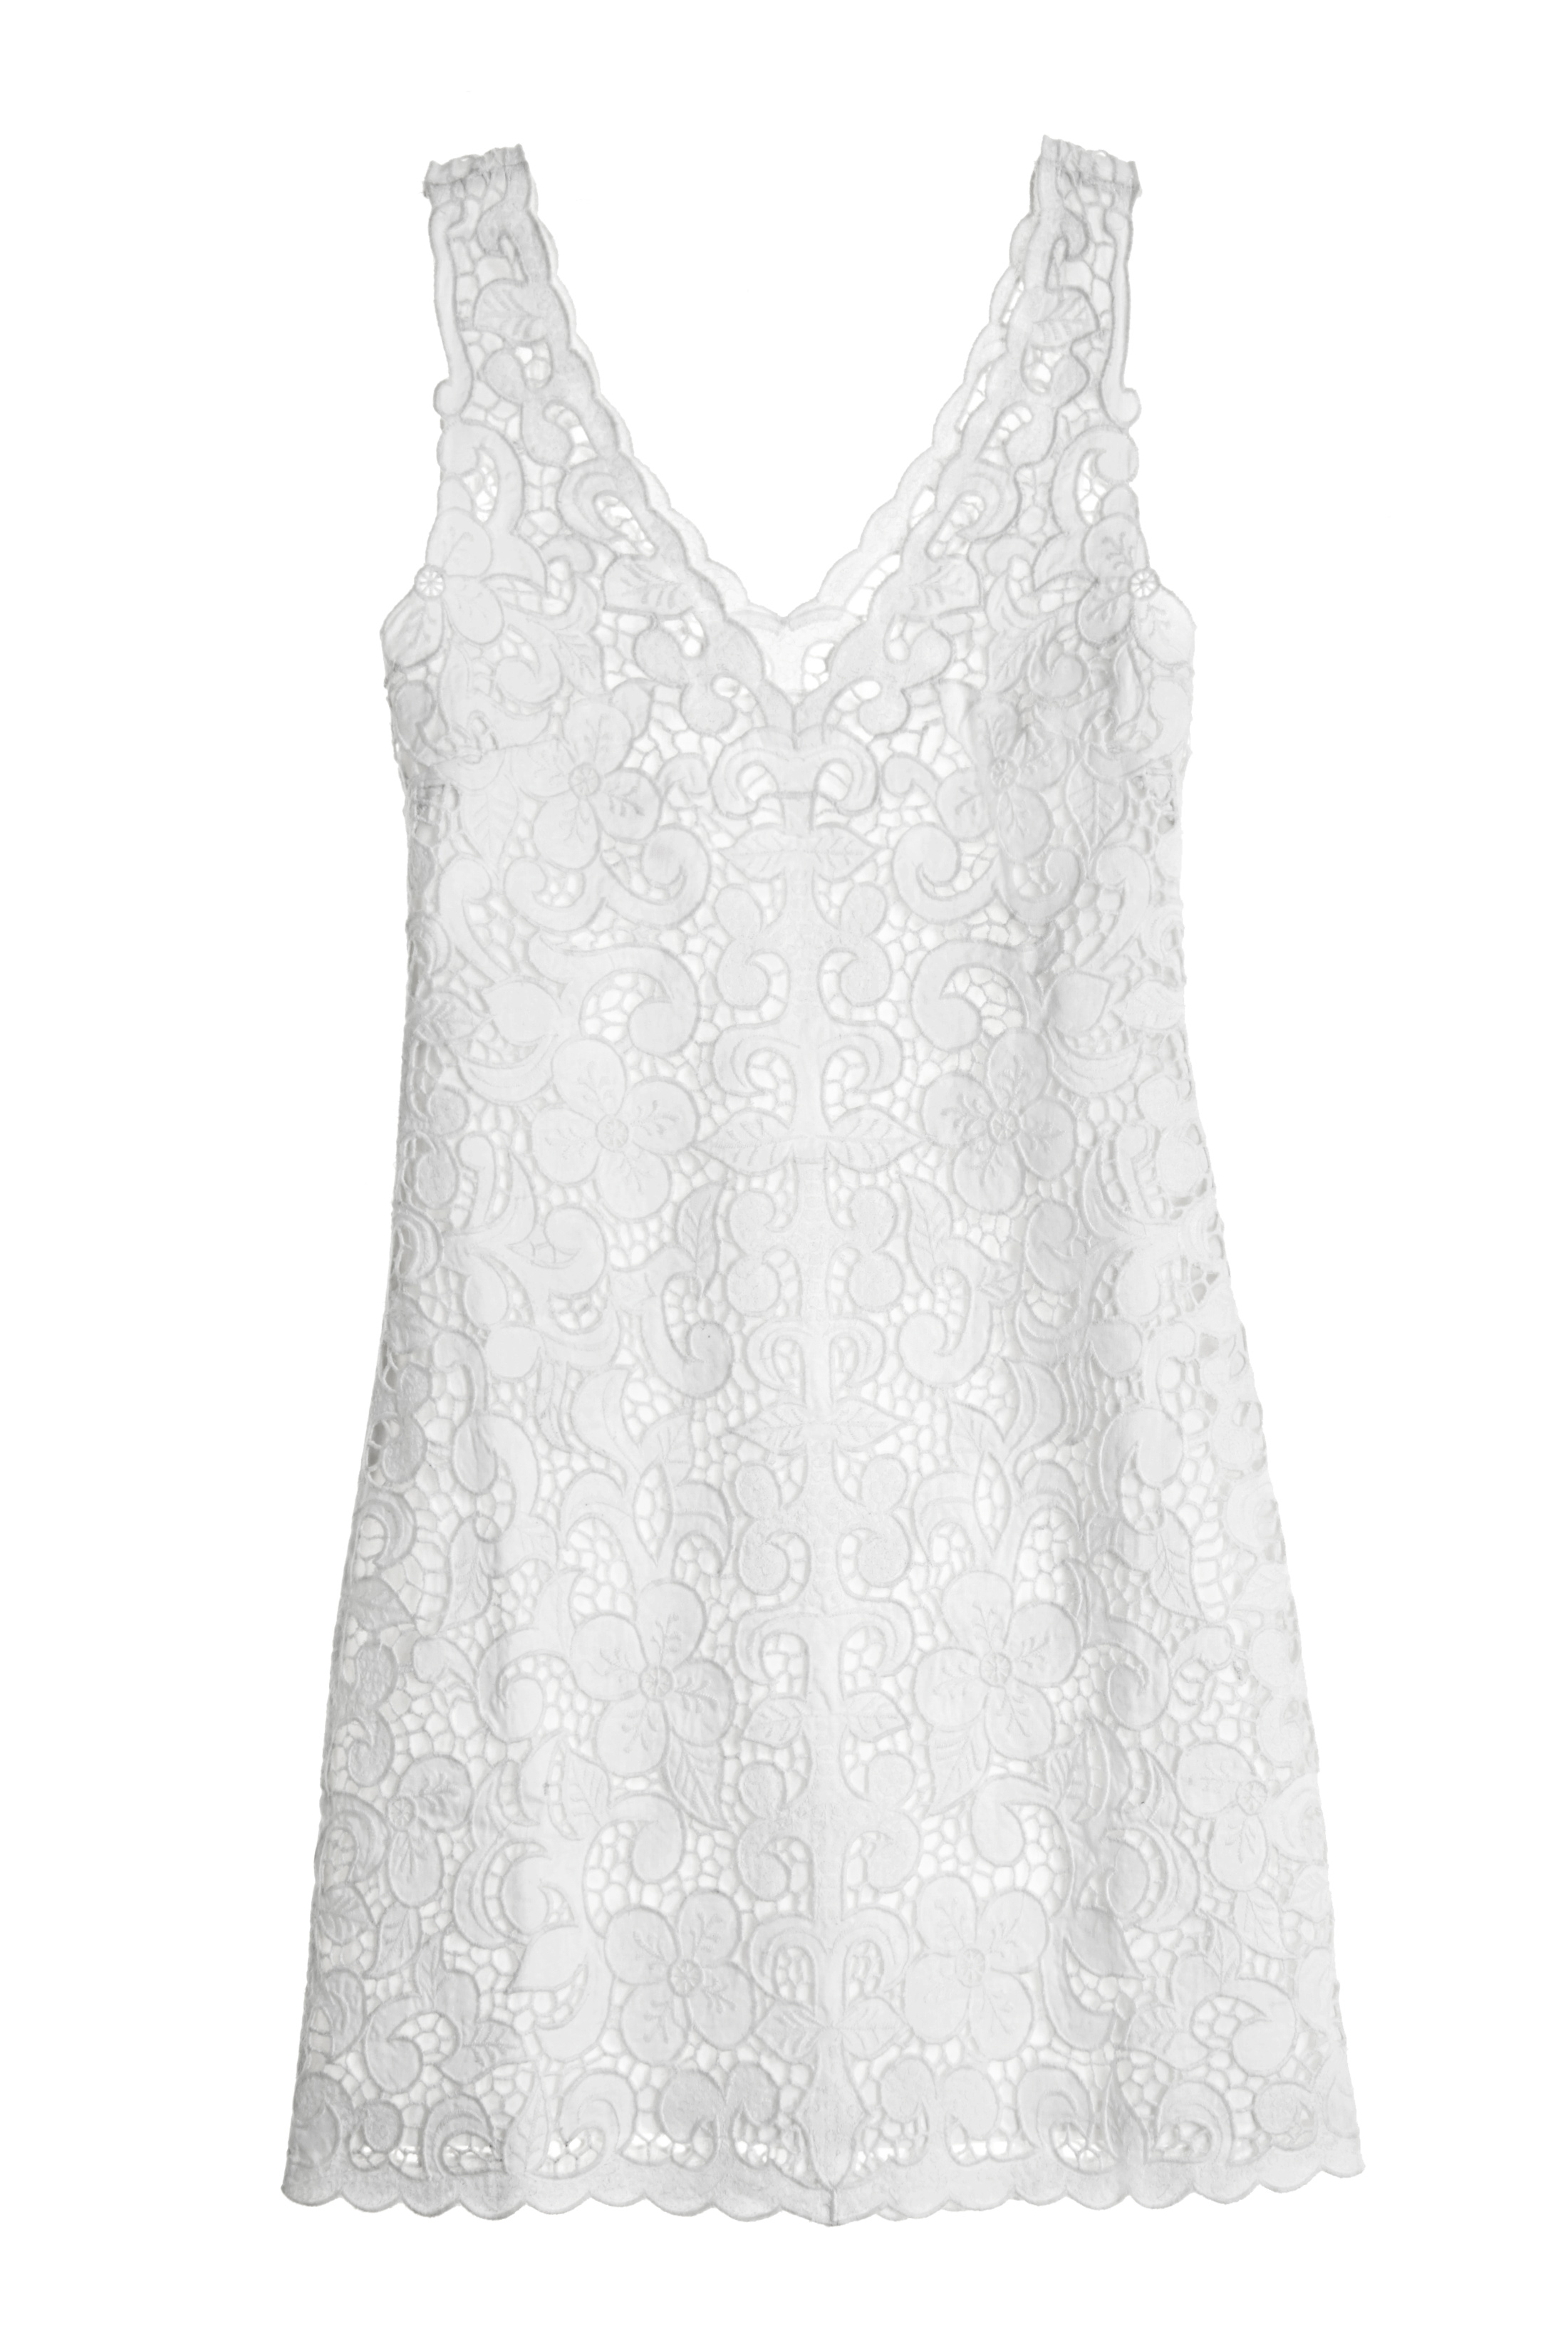 calypso-st-barth-bridal-kagami-dress-0315.jpg